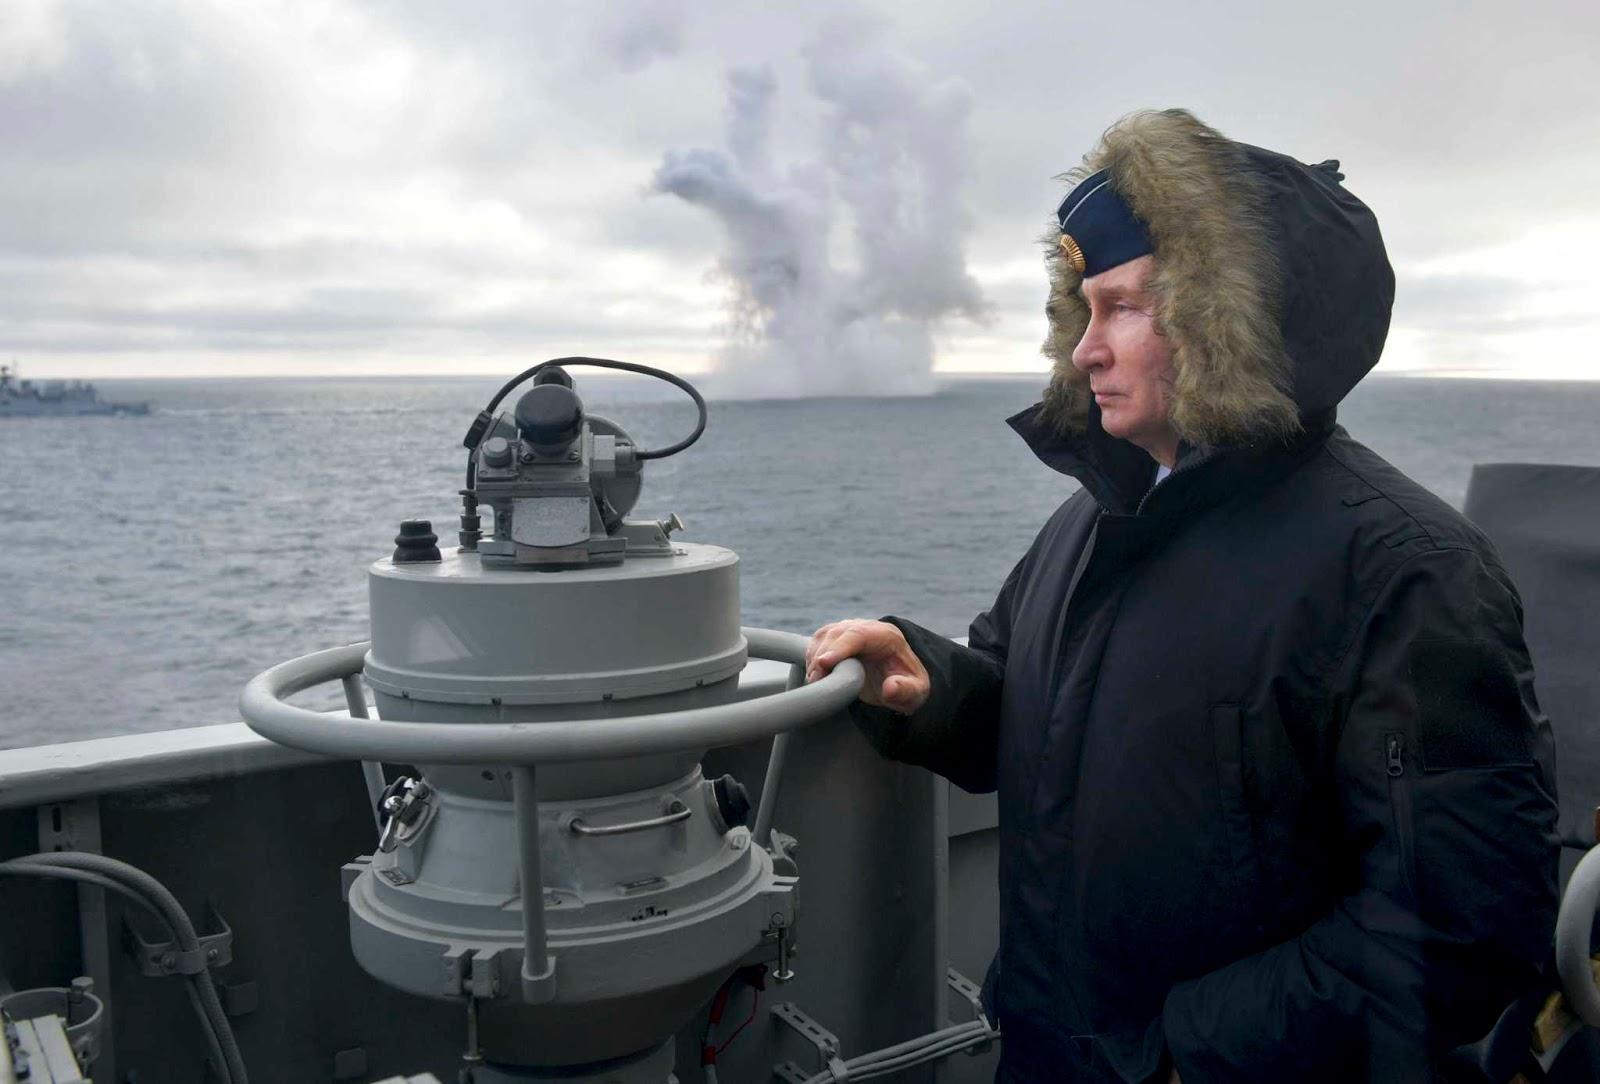 Mr. Putin Oversees Hypersonic Missile Test Near Crimea